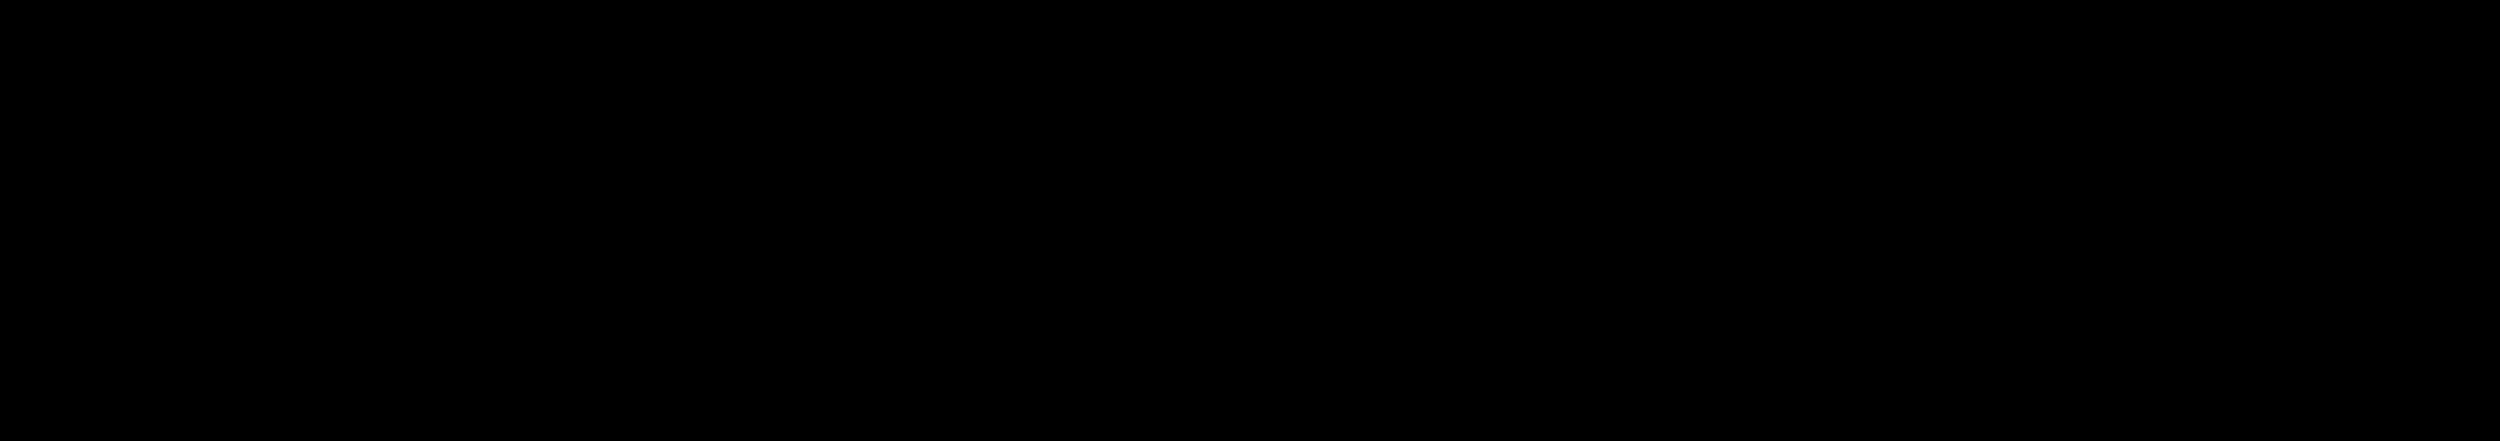 health-hut-lifestyle_myshopify_com_logo.png